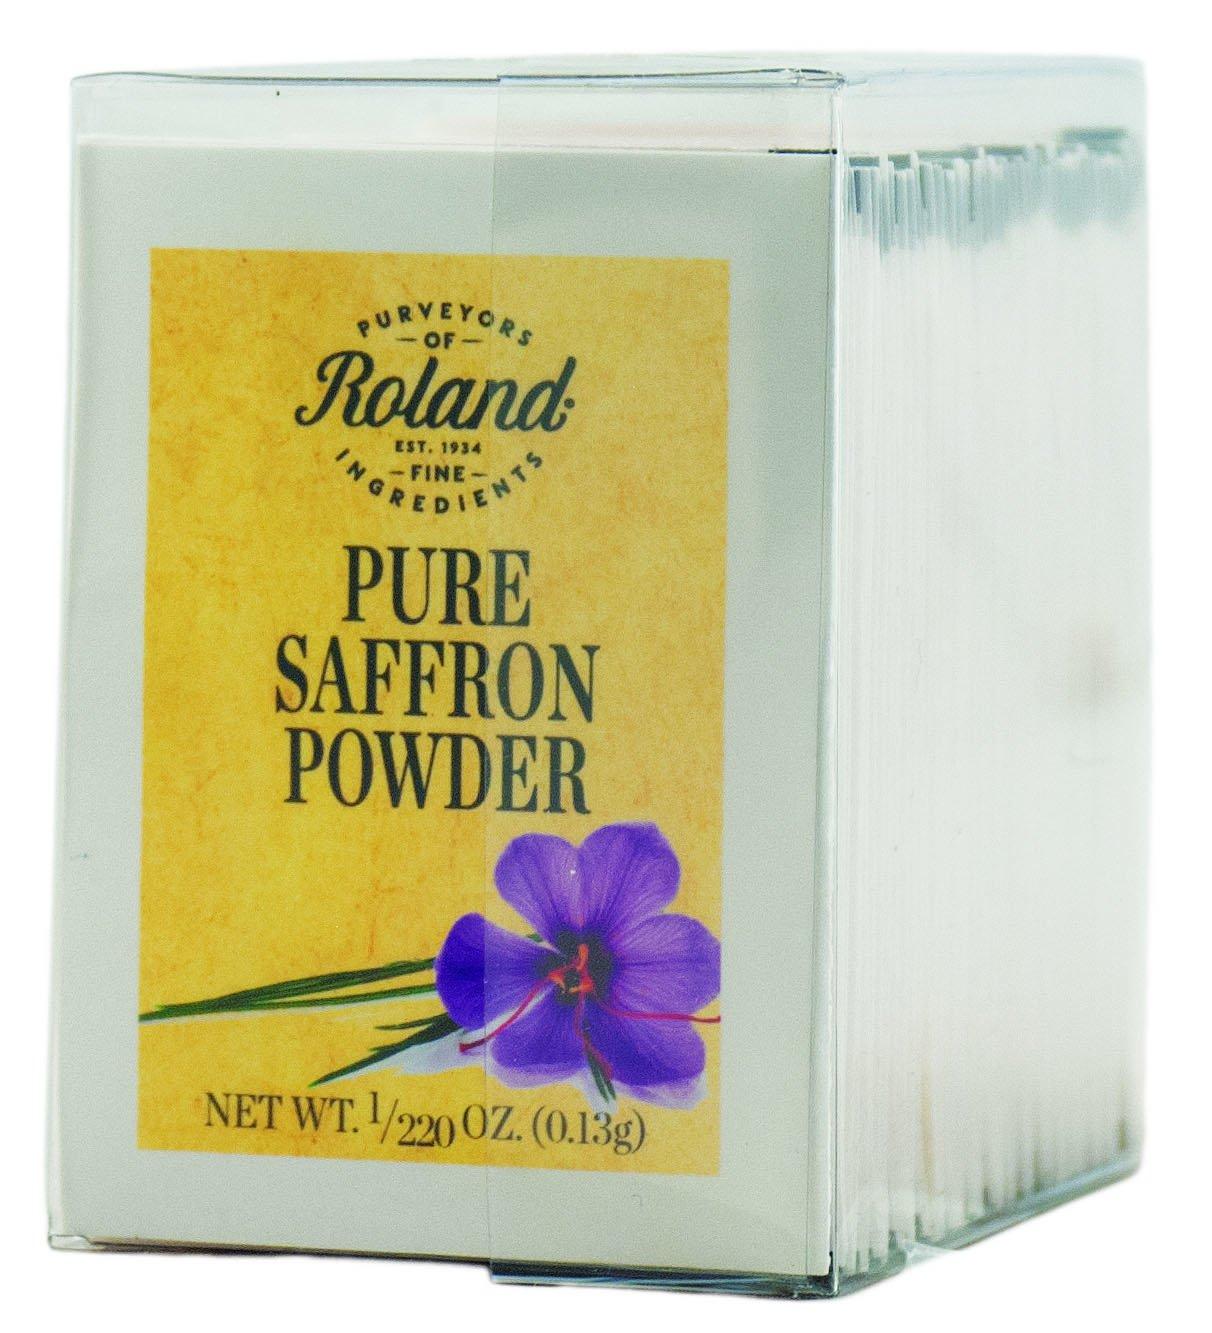 Popular shop is the lowest price challenge Roland Pure Saffron Today's only Powder 50 Envelopes 0.13g 220 1 Net Oz Wt.